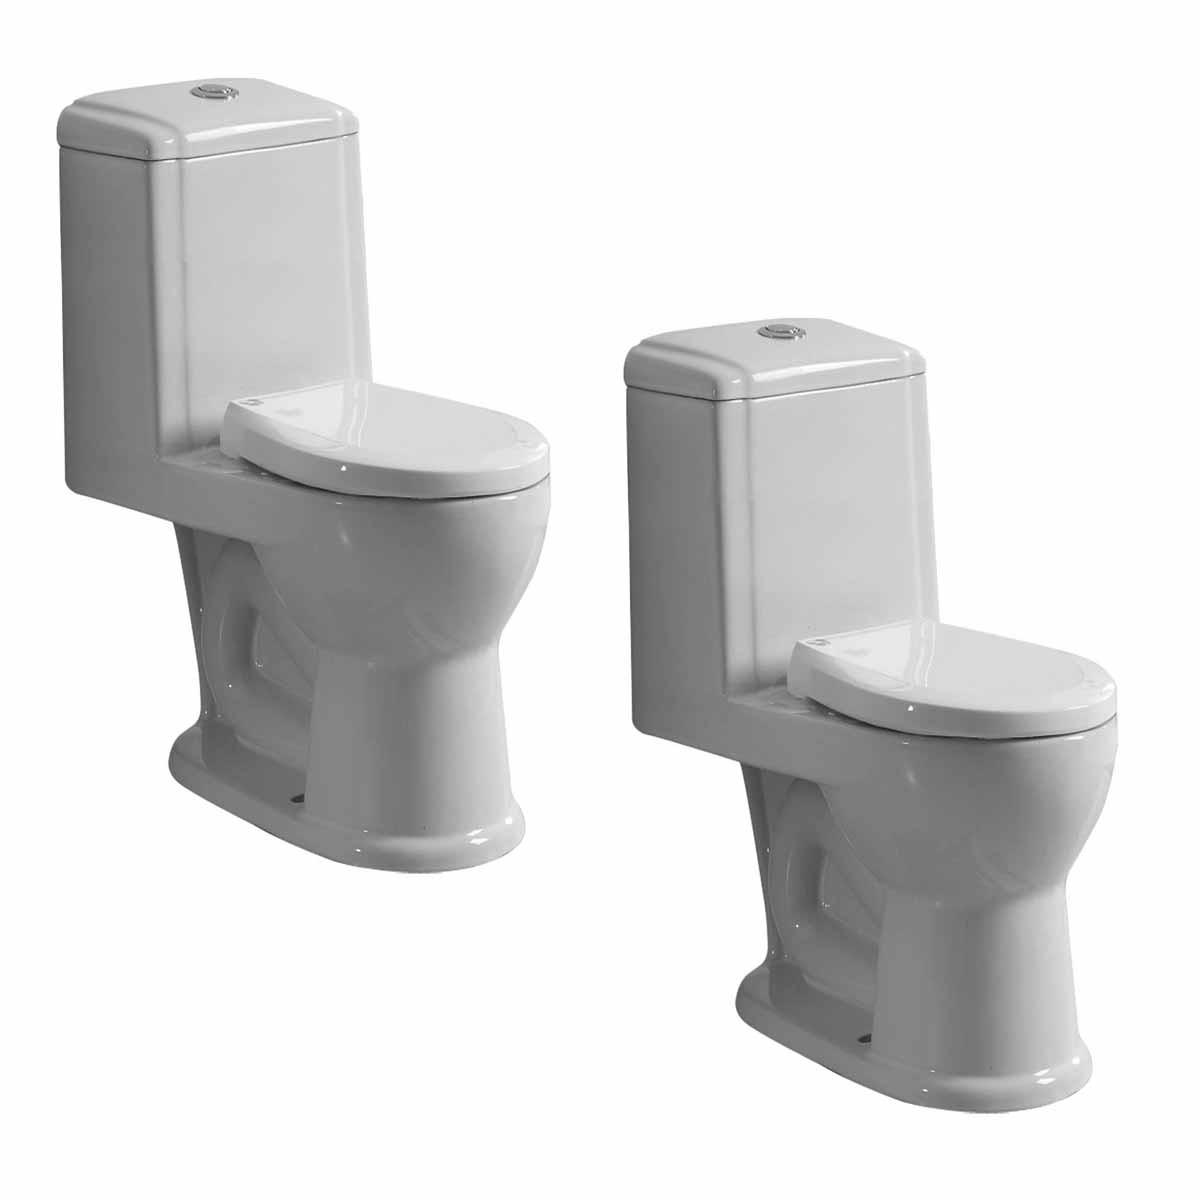 Porcelain Child's Toilet Potty Training Ceramic China Small Toilet